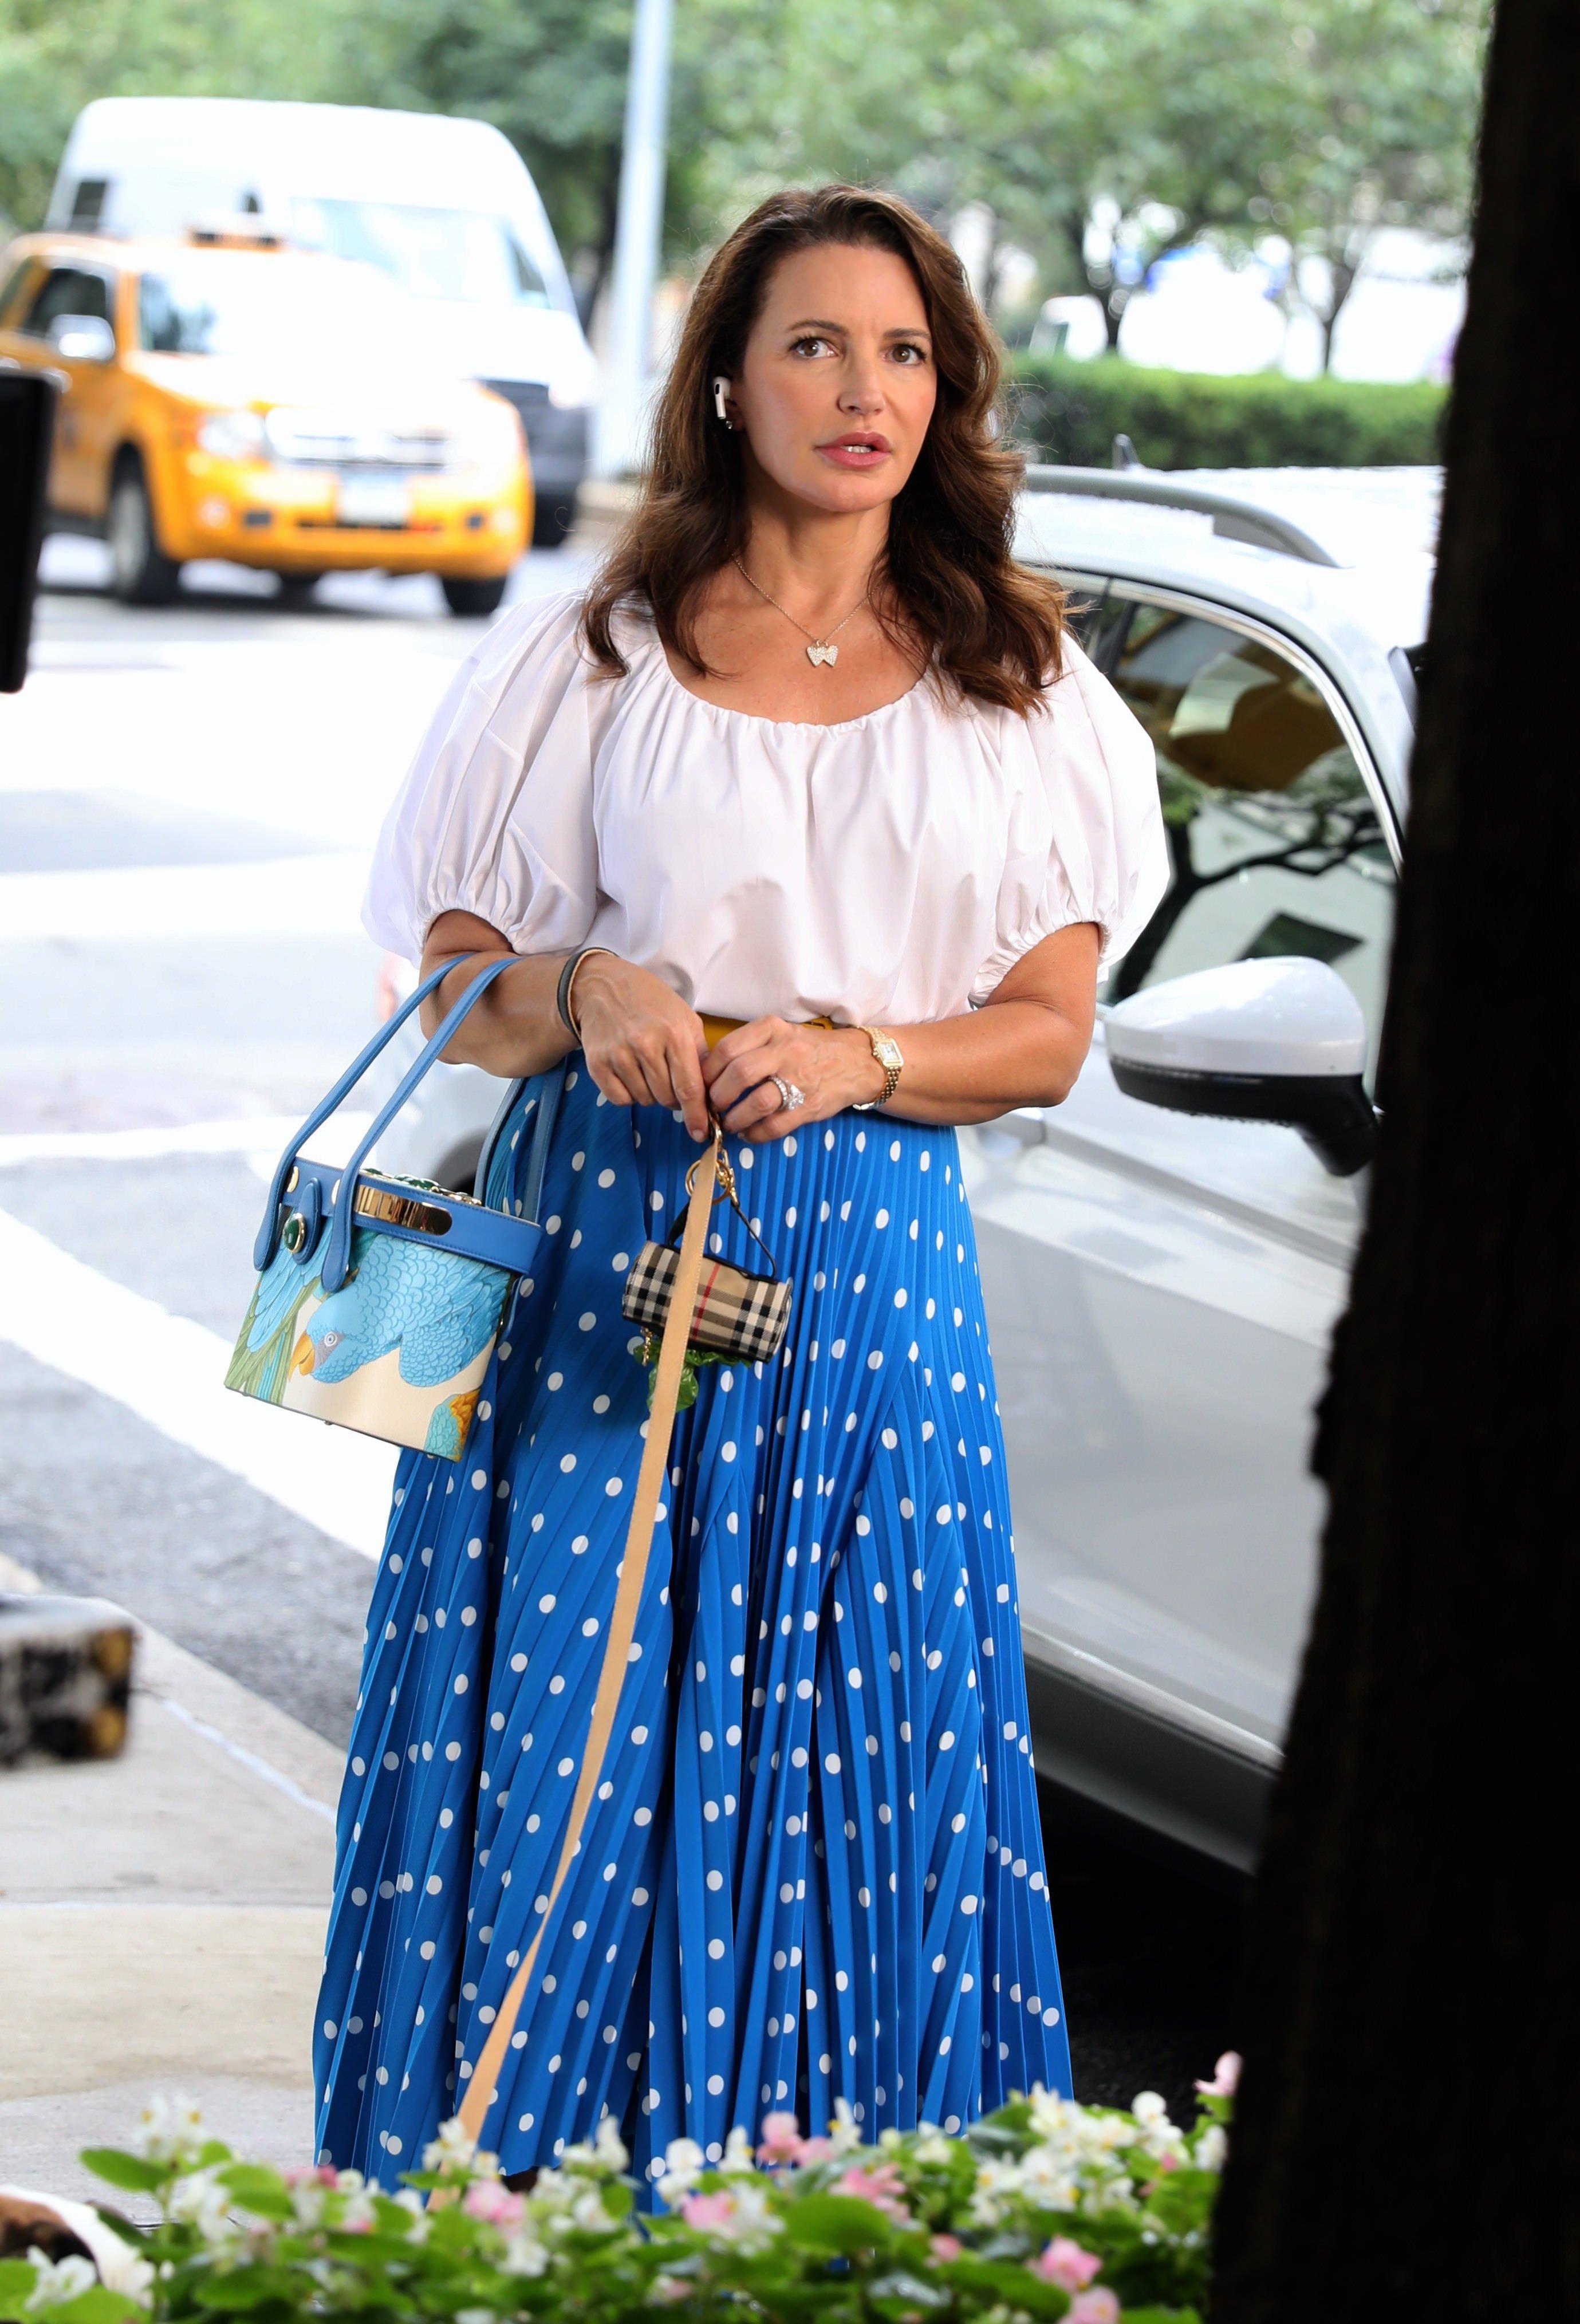 Celebrity Sightings In New York - July 12, 2021